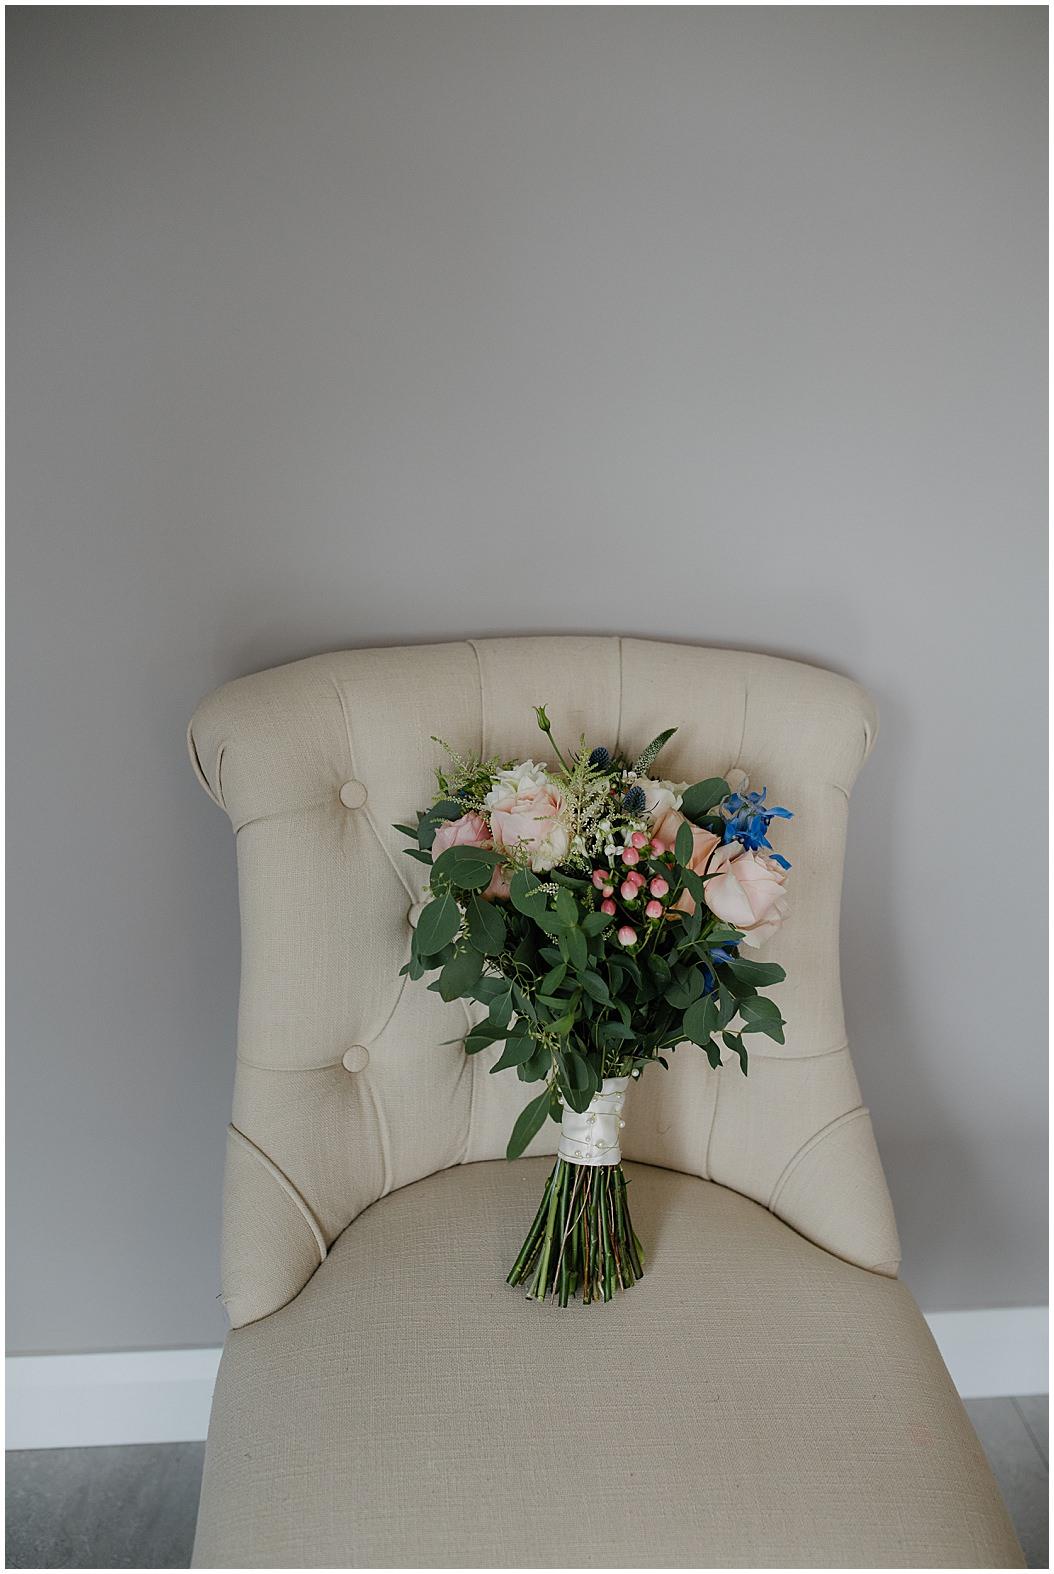 tempo-manor-wedding-jude-browne-photography_0008.jpg